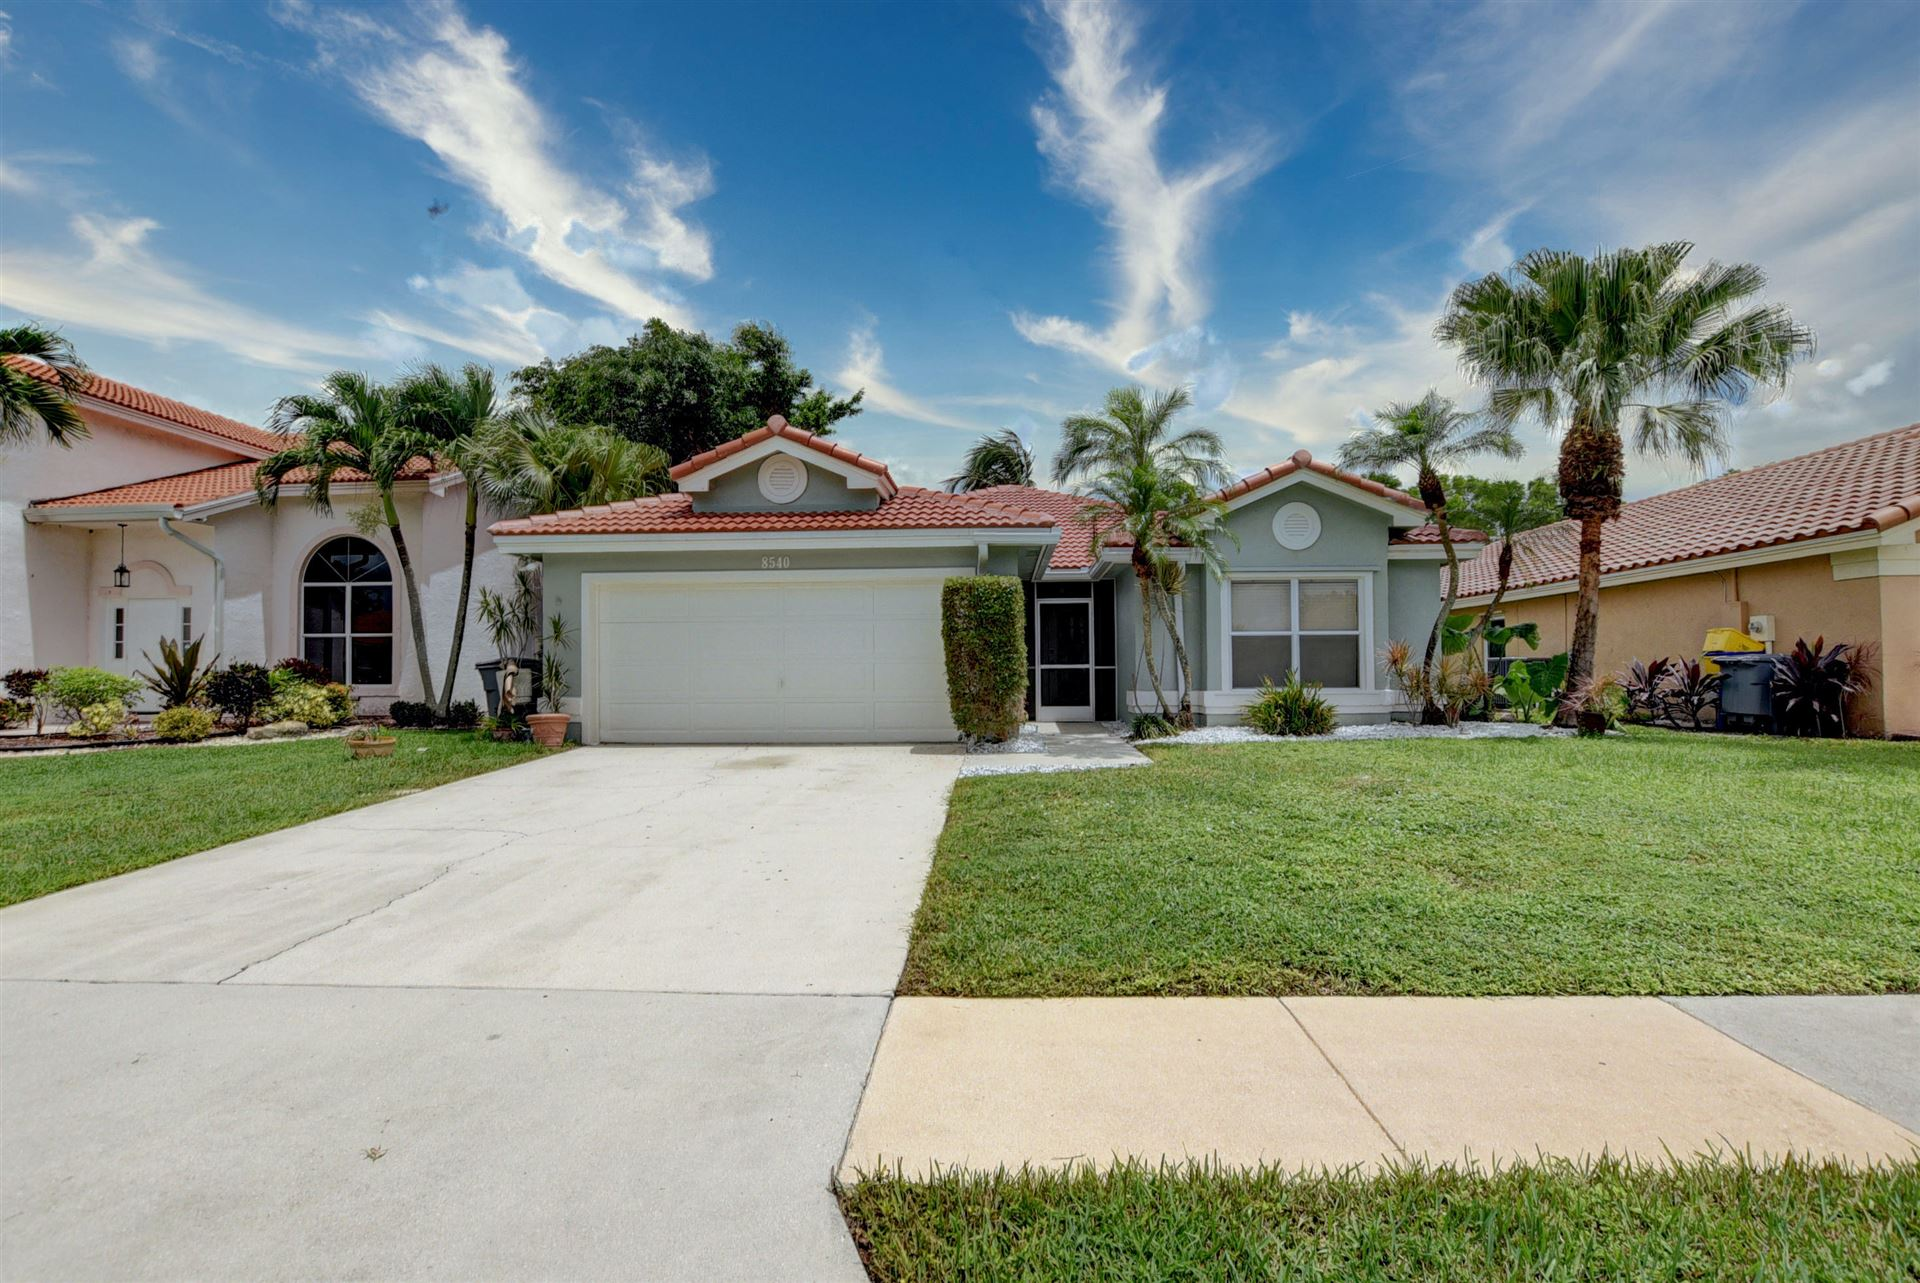 8540 Tourmaline Boulevard, Boynton Beach, FL 33472 - MLS#: RX-10724096